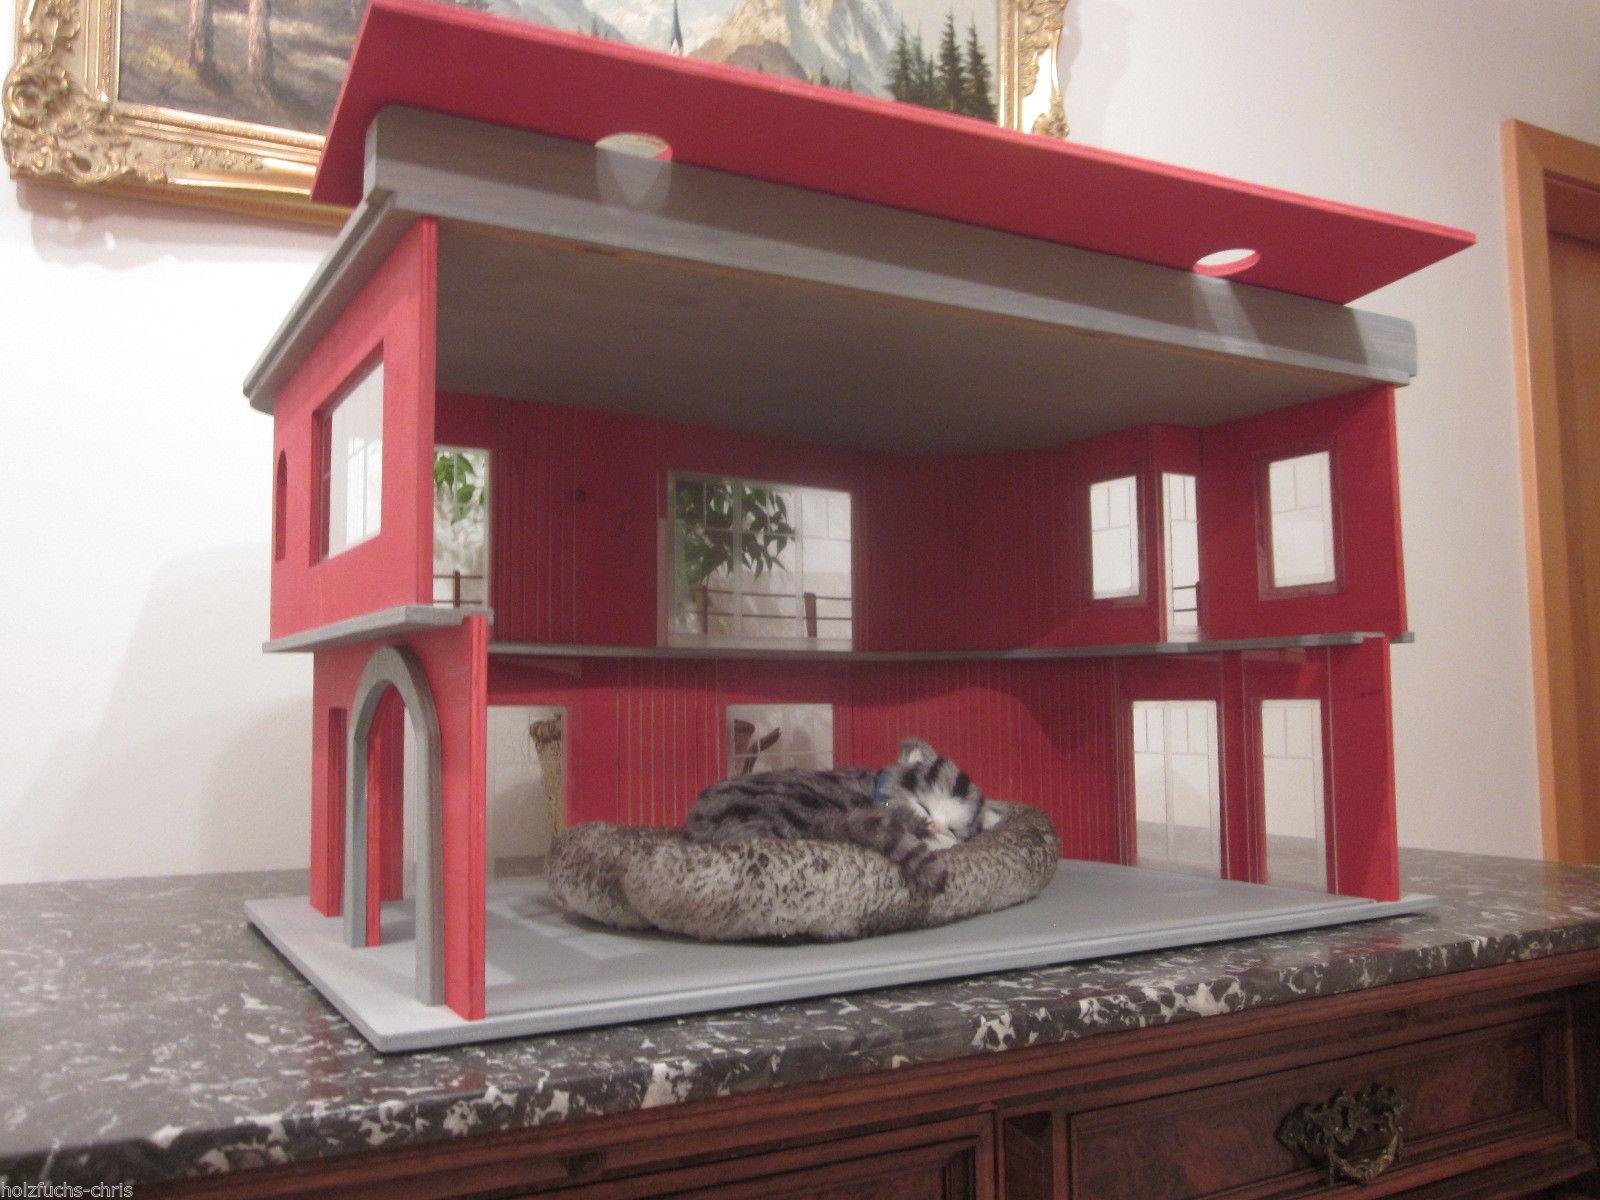 katzenhaus villa bauhaus lasiert 6 katzen eldorado. Black Bedroom Furniture Sets. Home Design Ideas